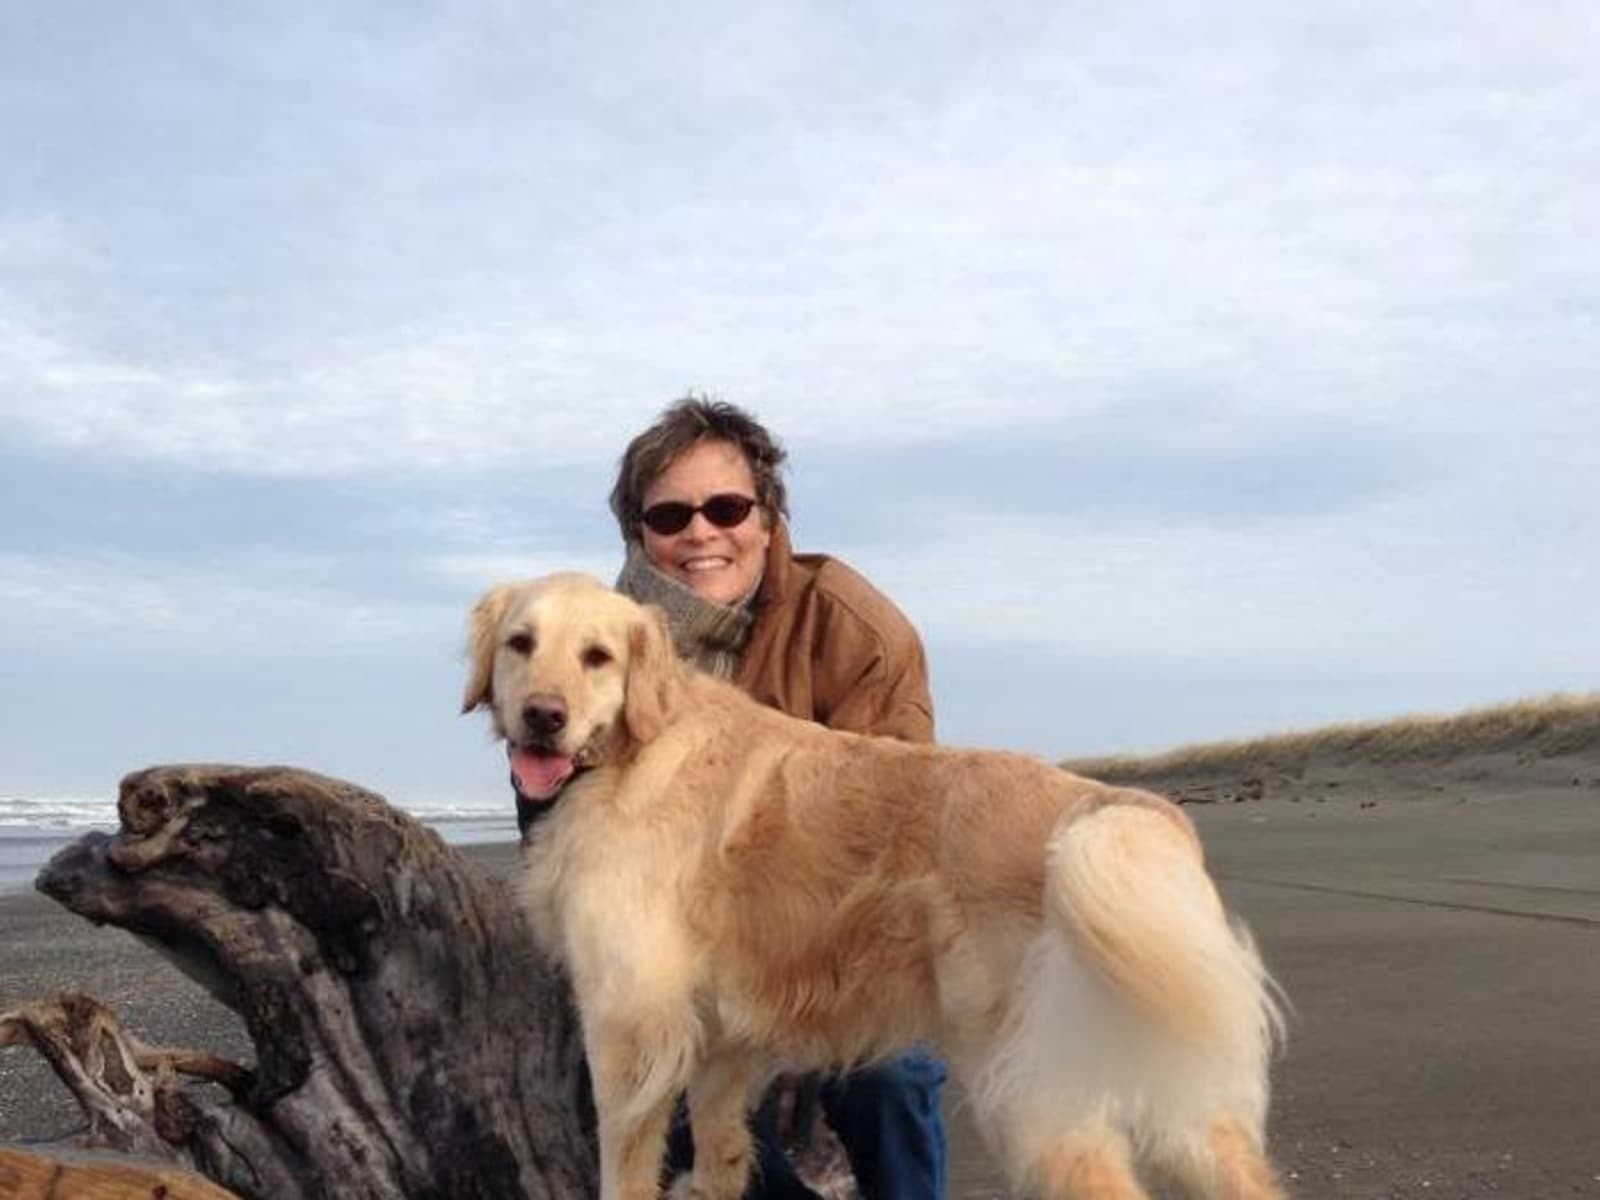 Karen from Seattle, Washington, United States